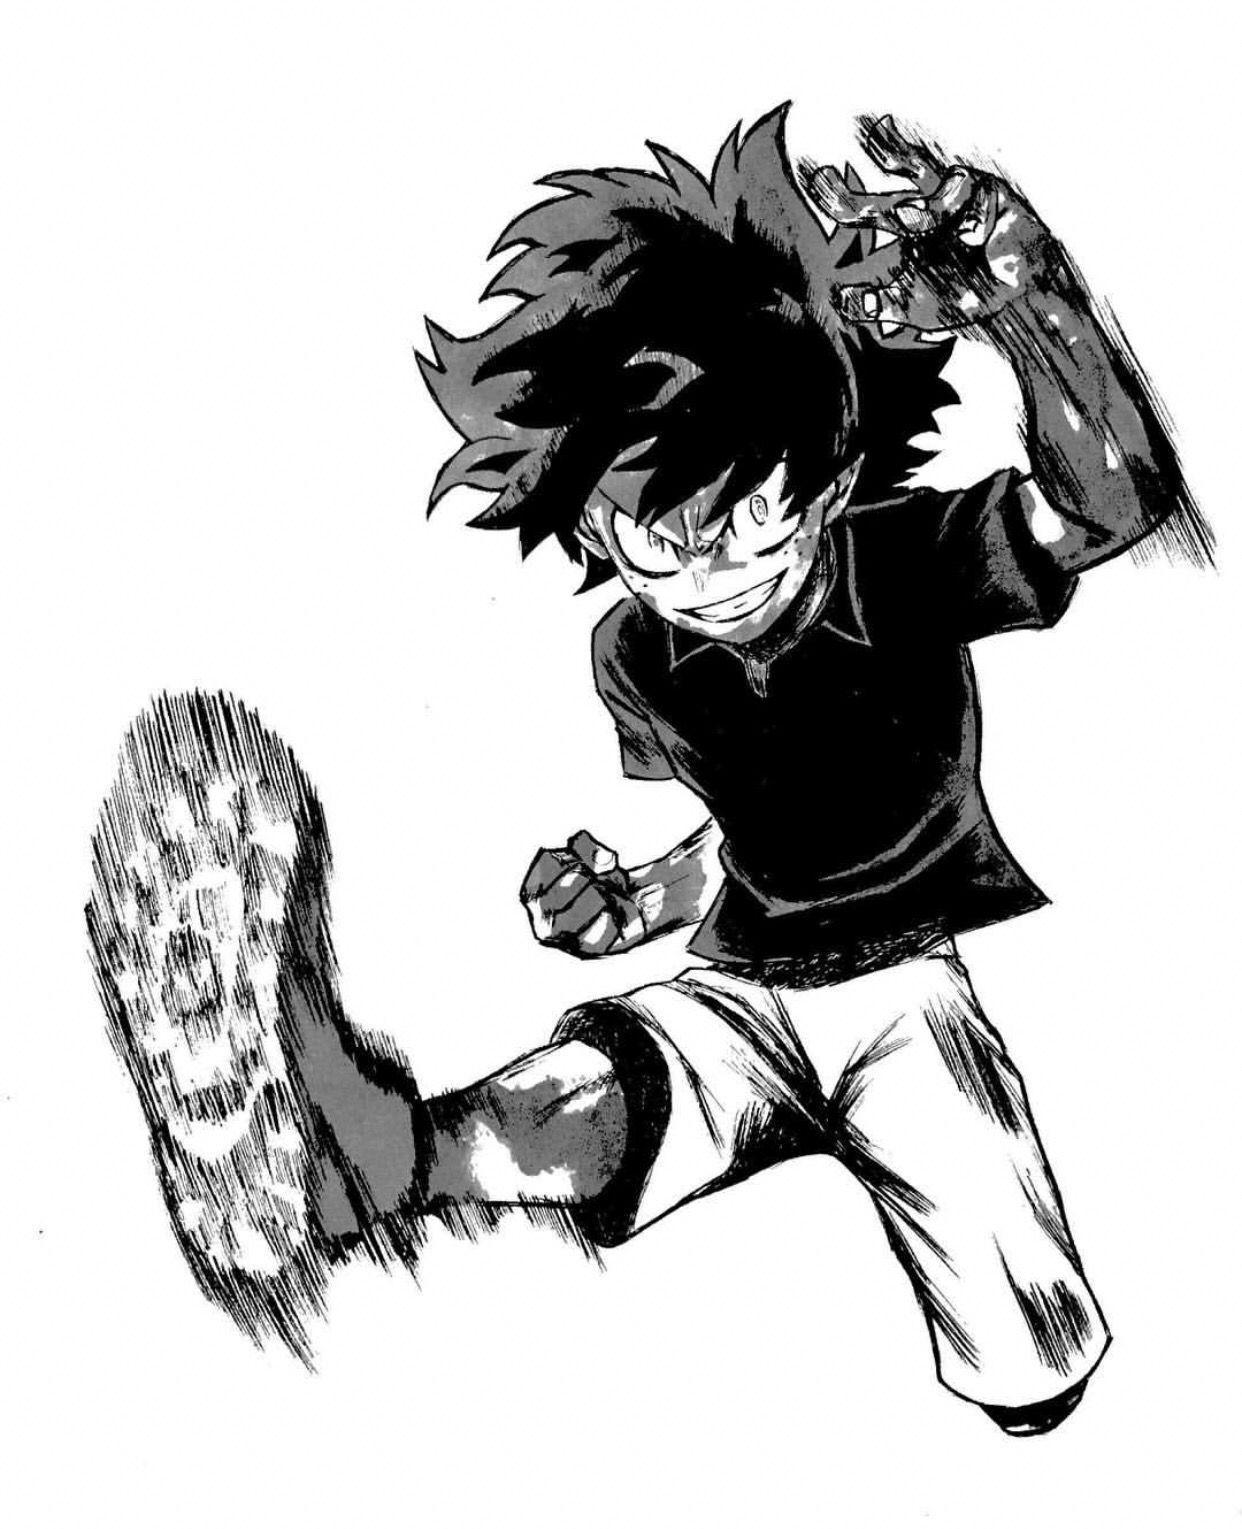 Deku By Abdoumangaart Visit Our Website For More Anime And Animeart Tap The Link Below Myheroacademia Sao Anime Anime Artwork Anime Art